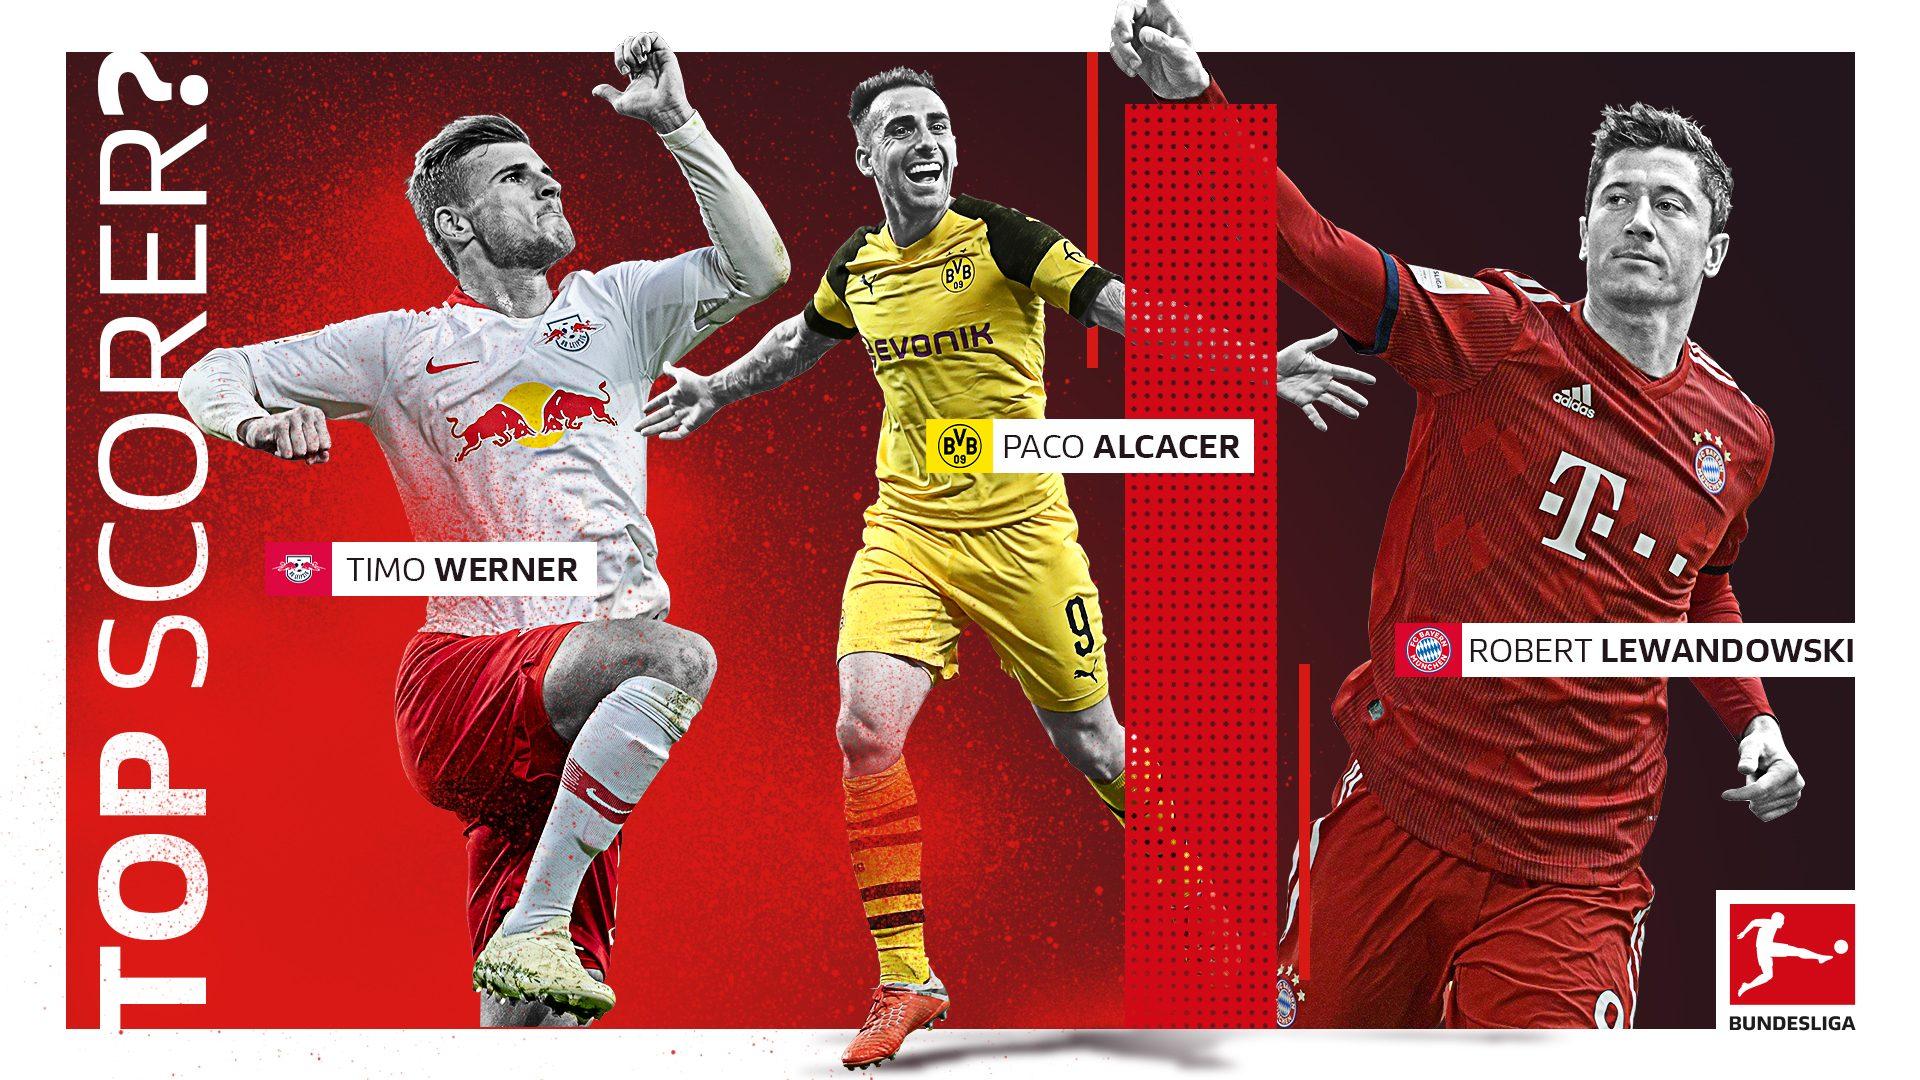 Robert Lewandowski and the players who could dethrone him as the Bundesliga's top scorer